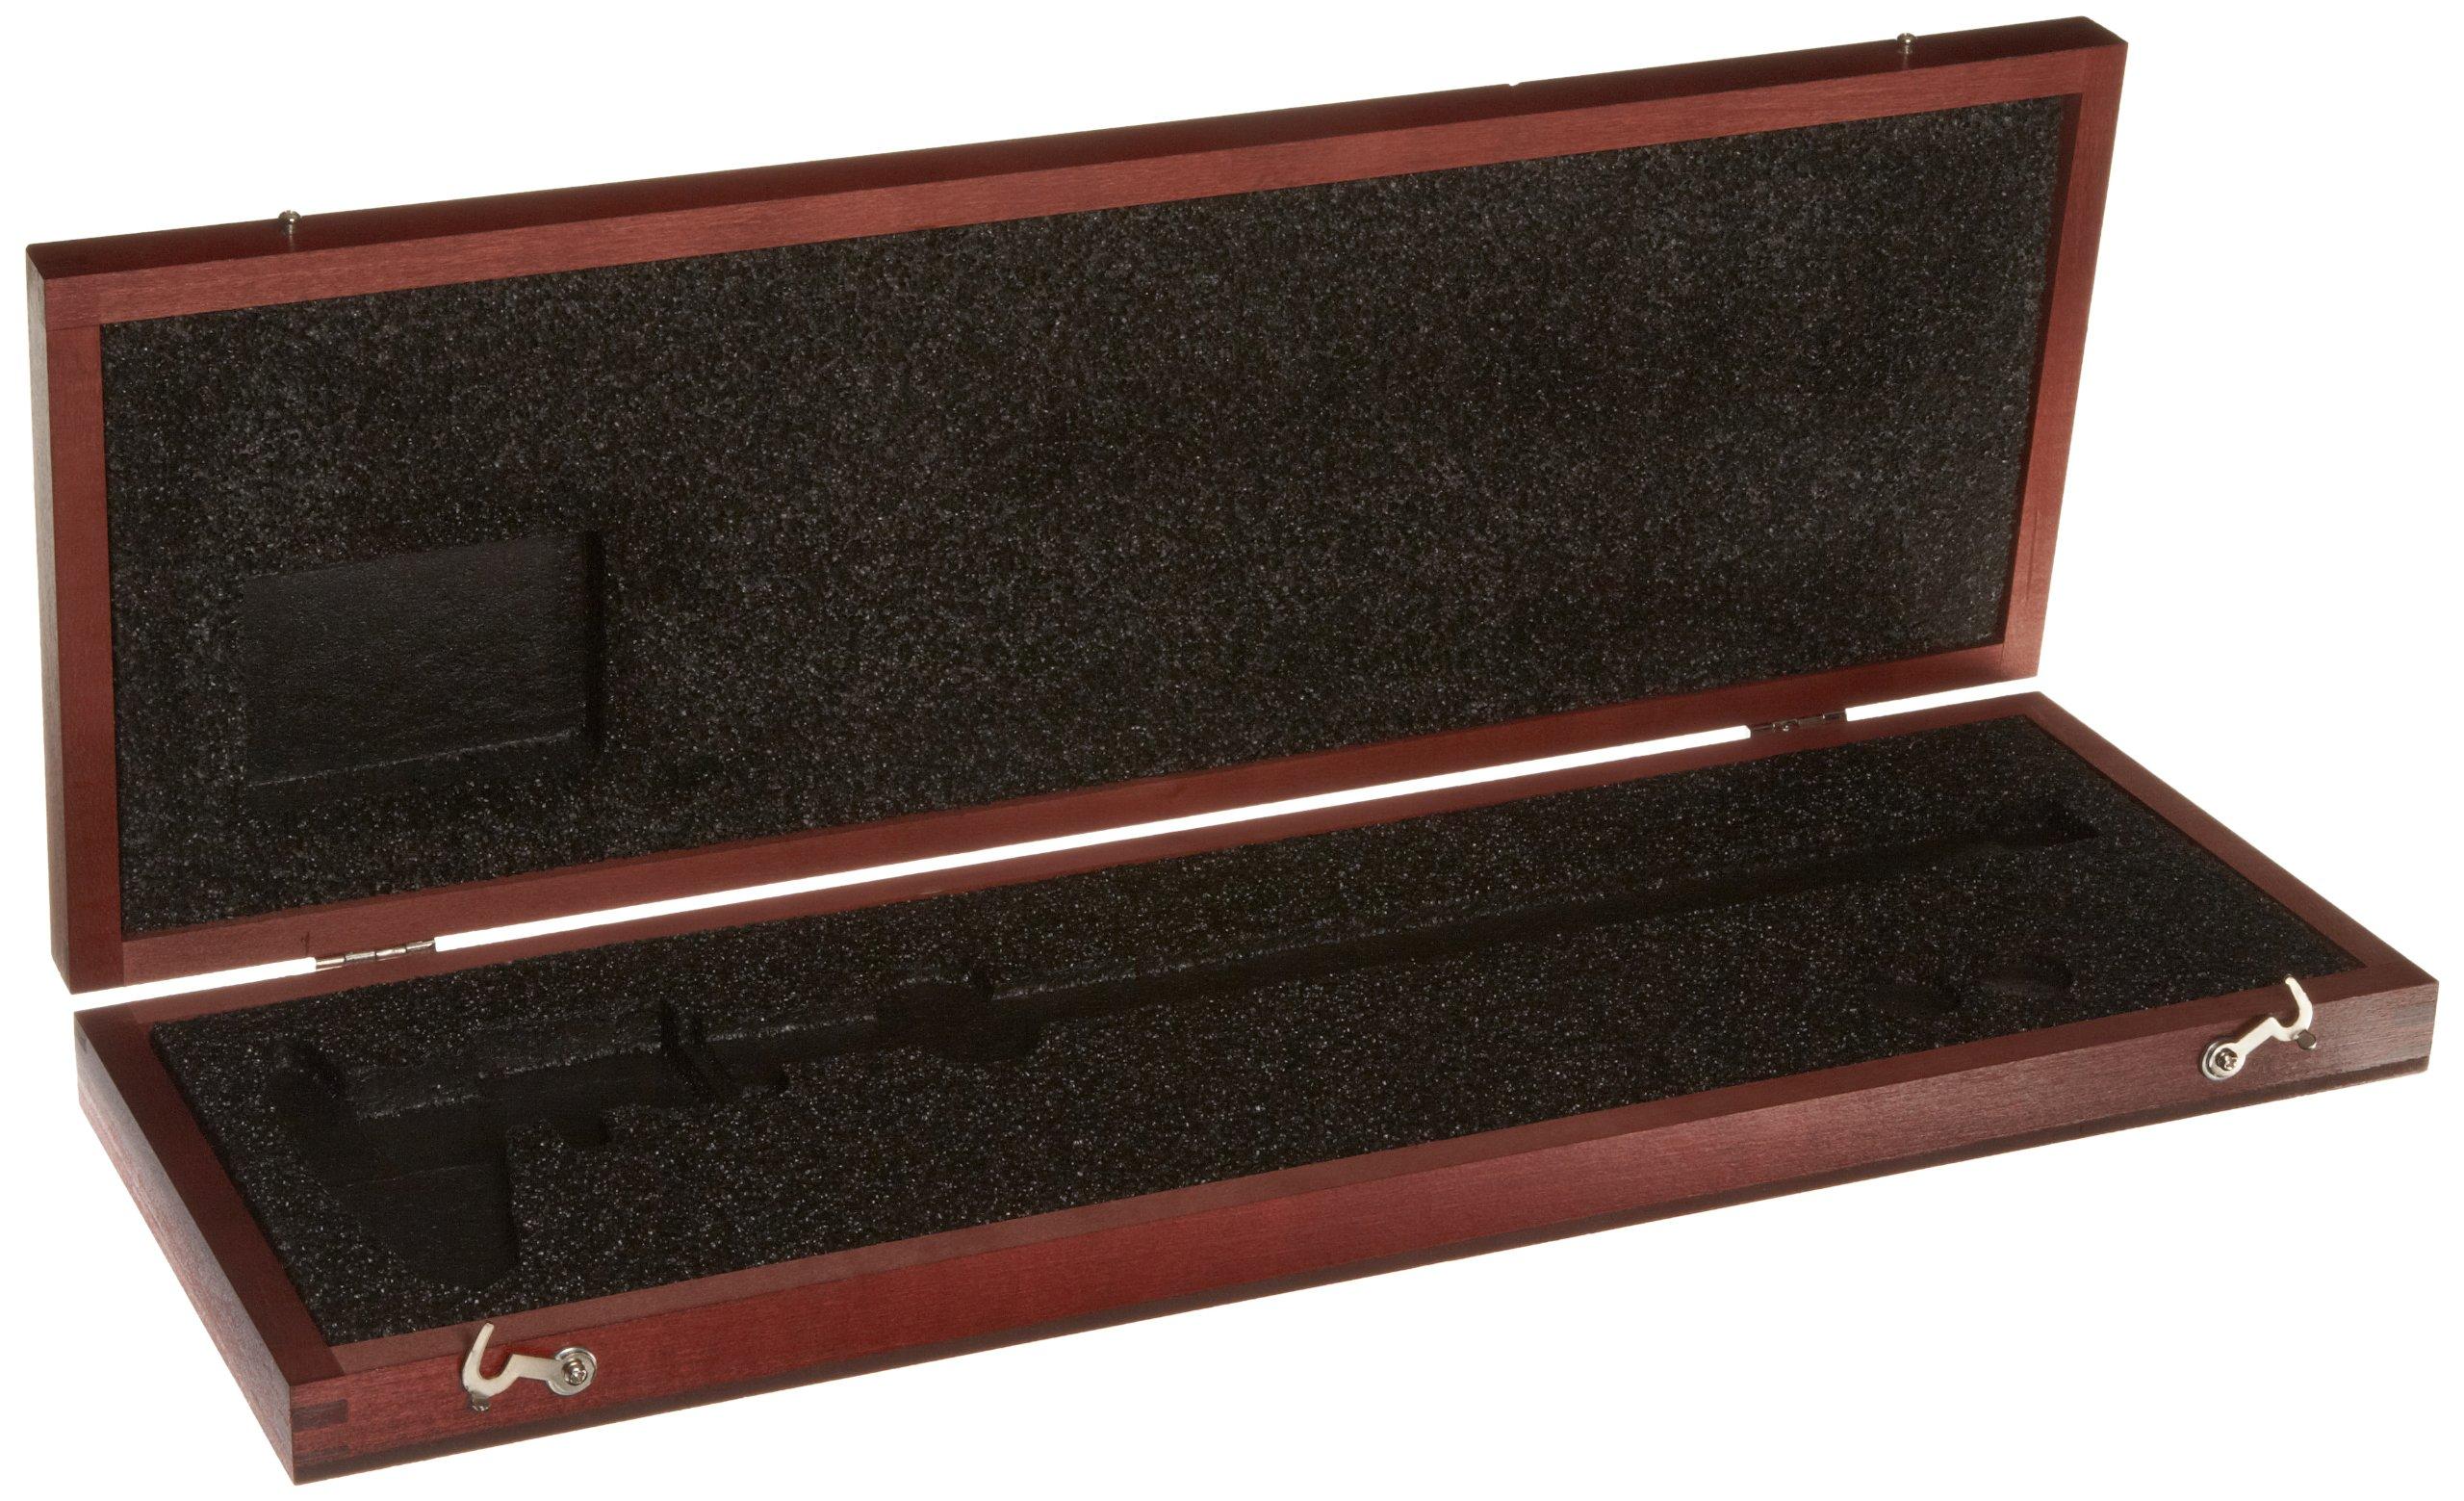 Starrett 946 Finished Wood Case For 12''/300mm Dial Caliper